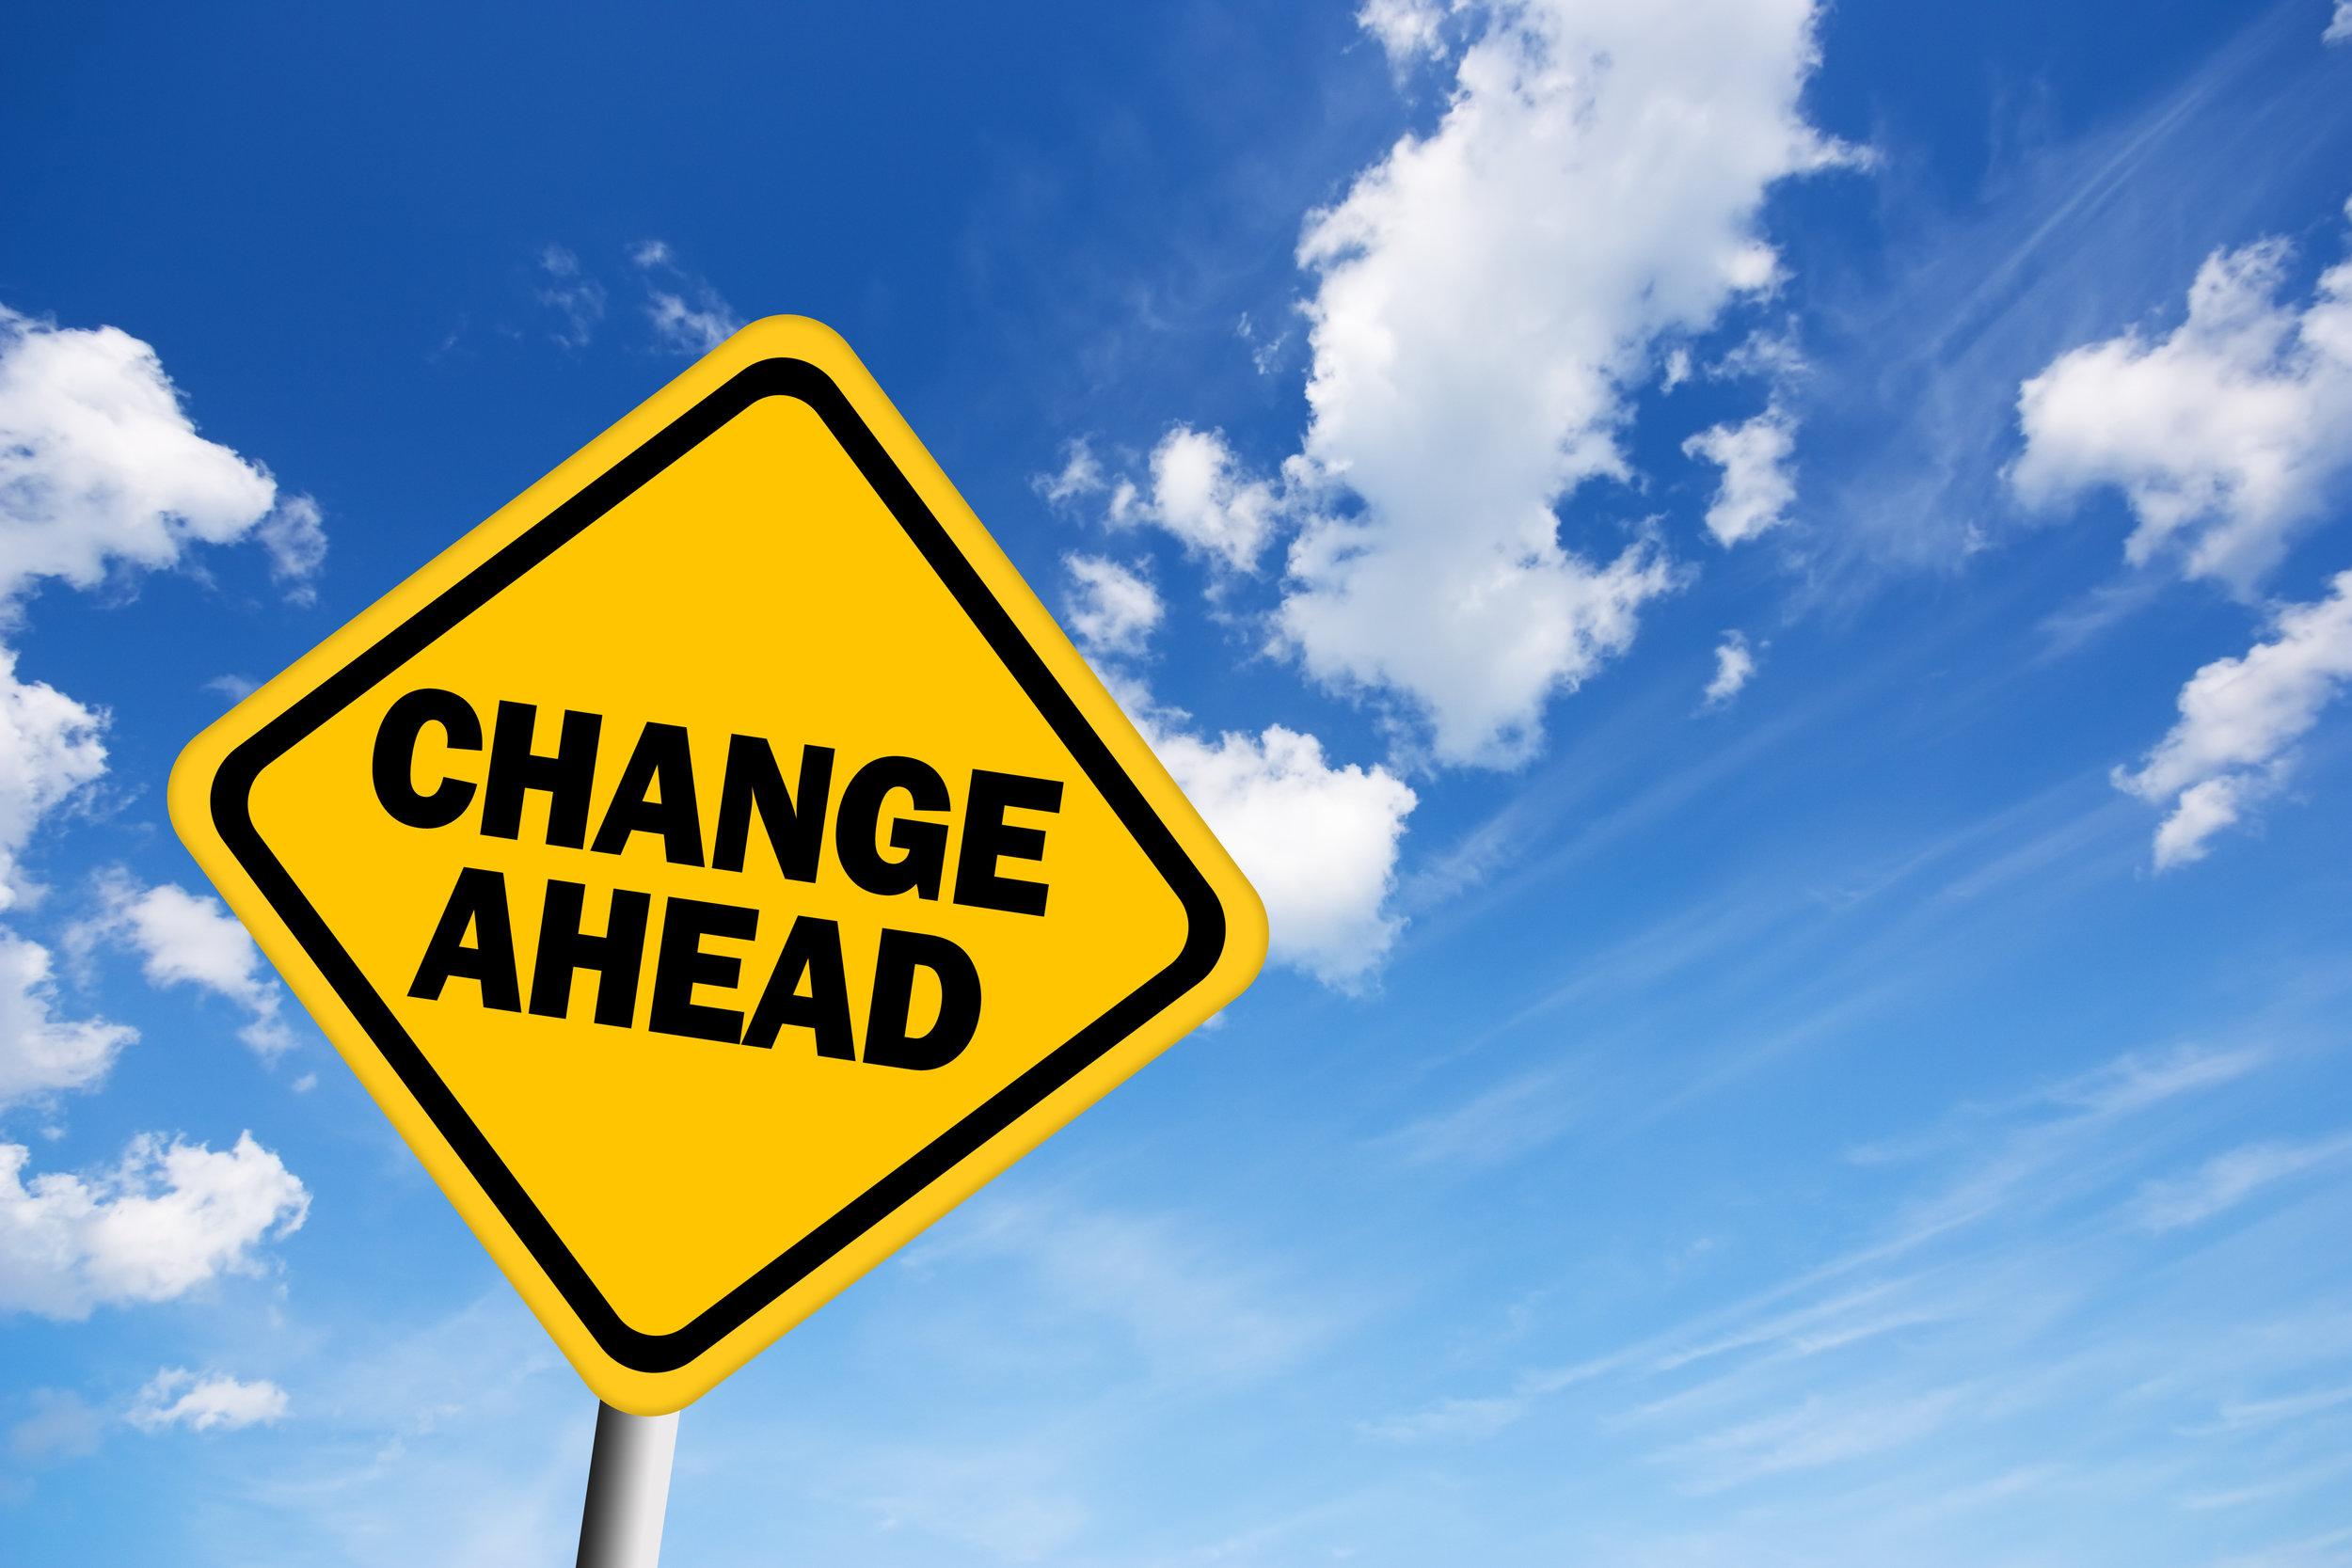 change ahead sign.jpg